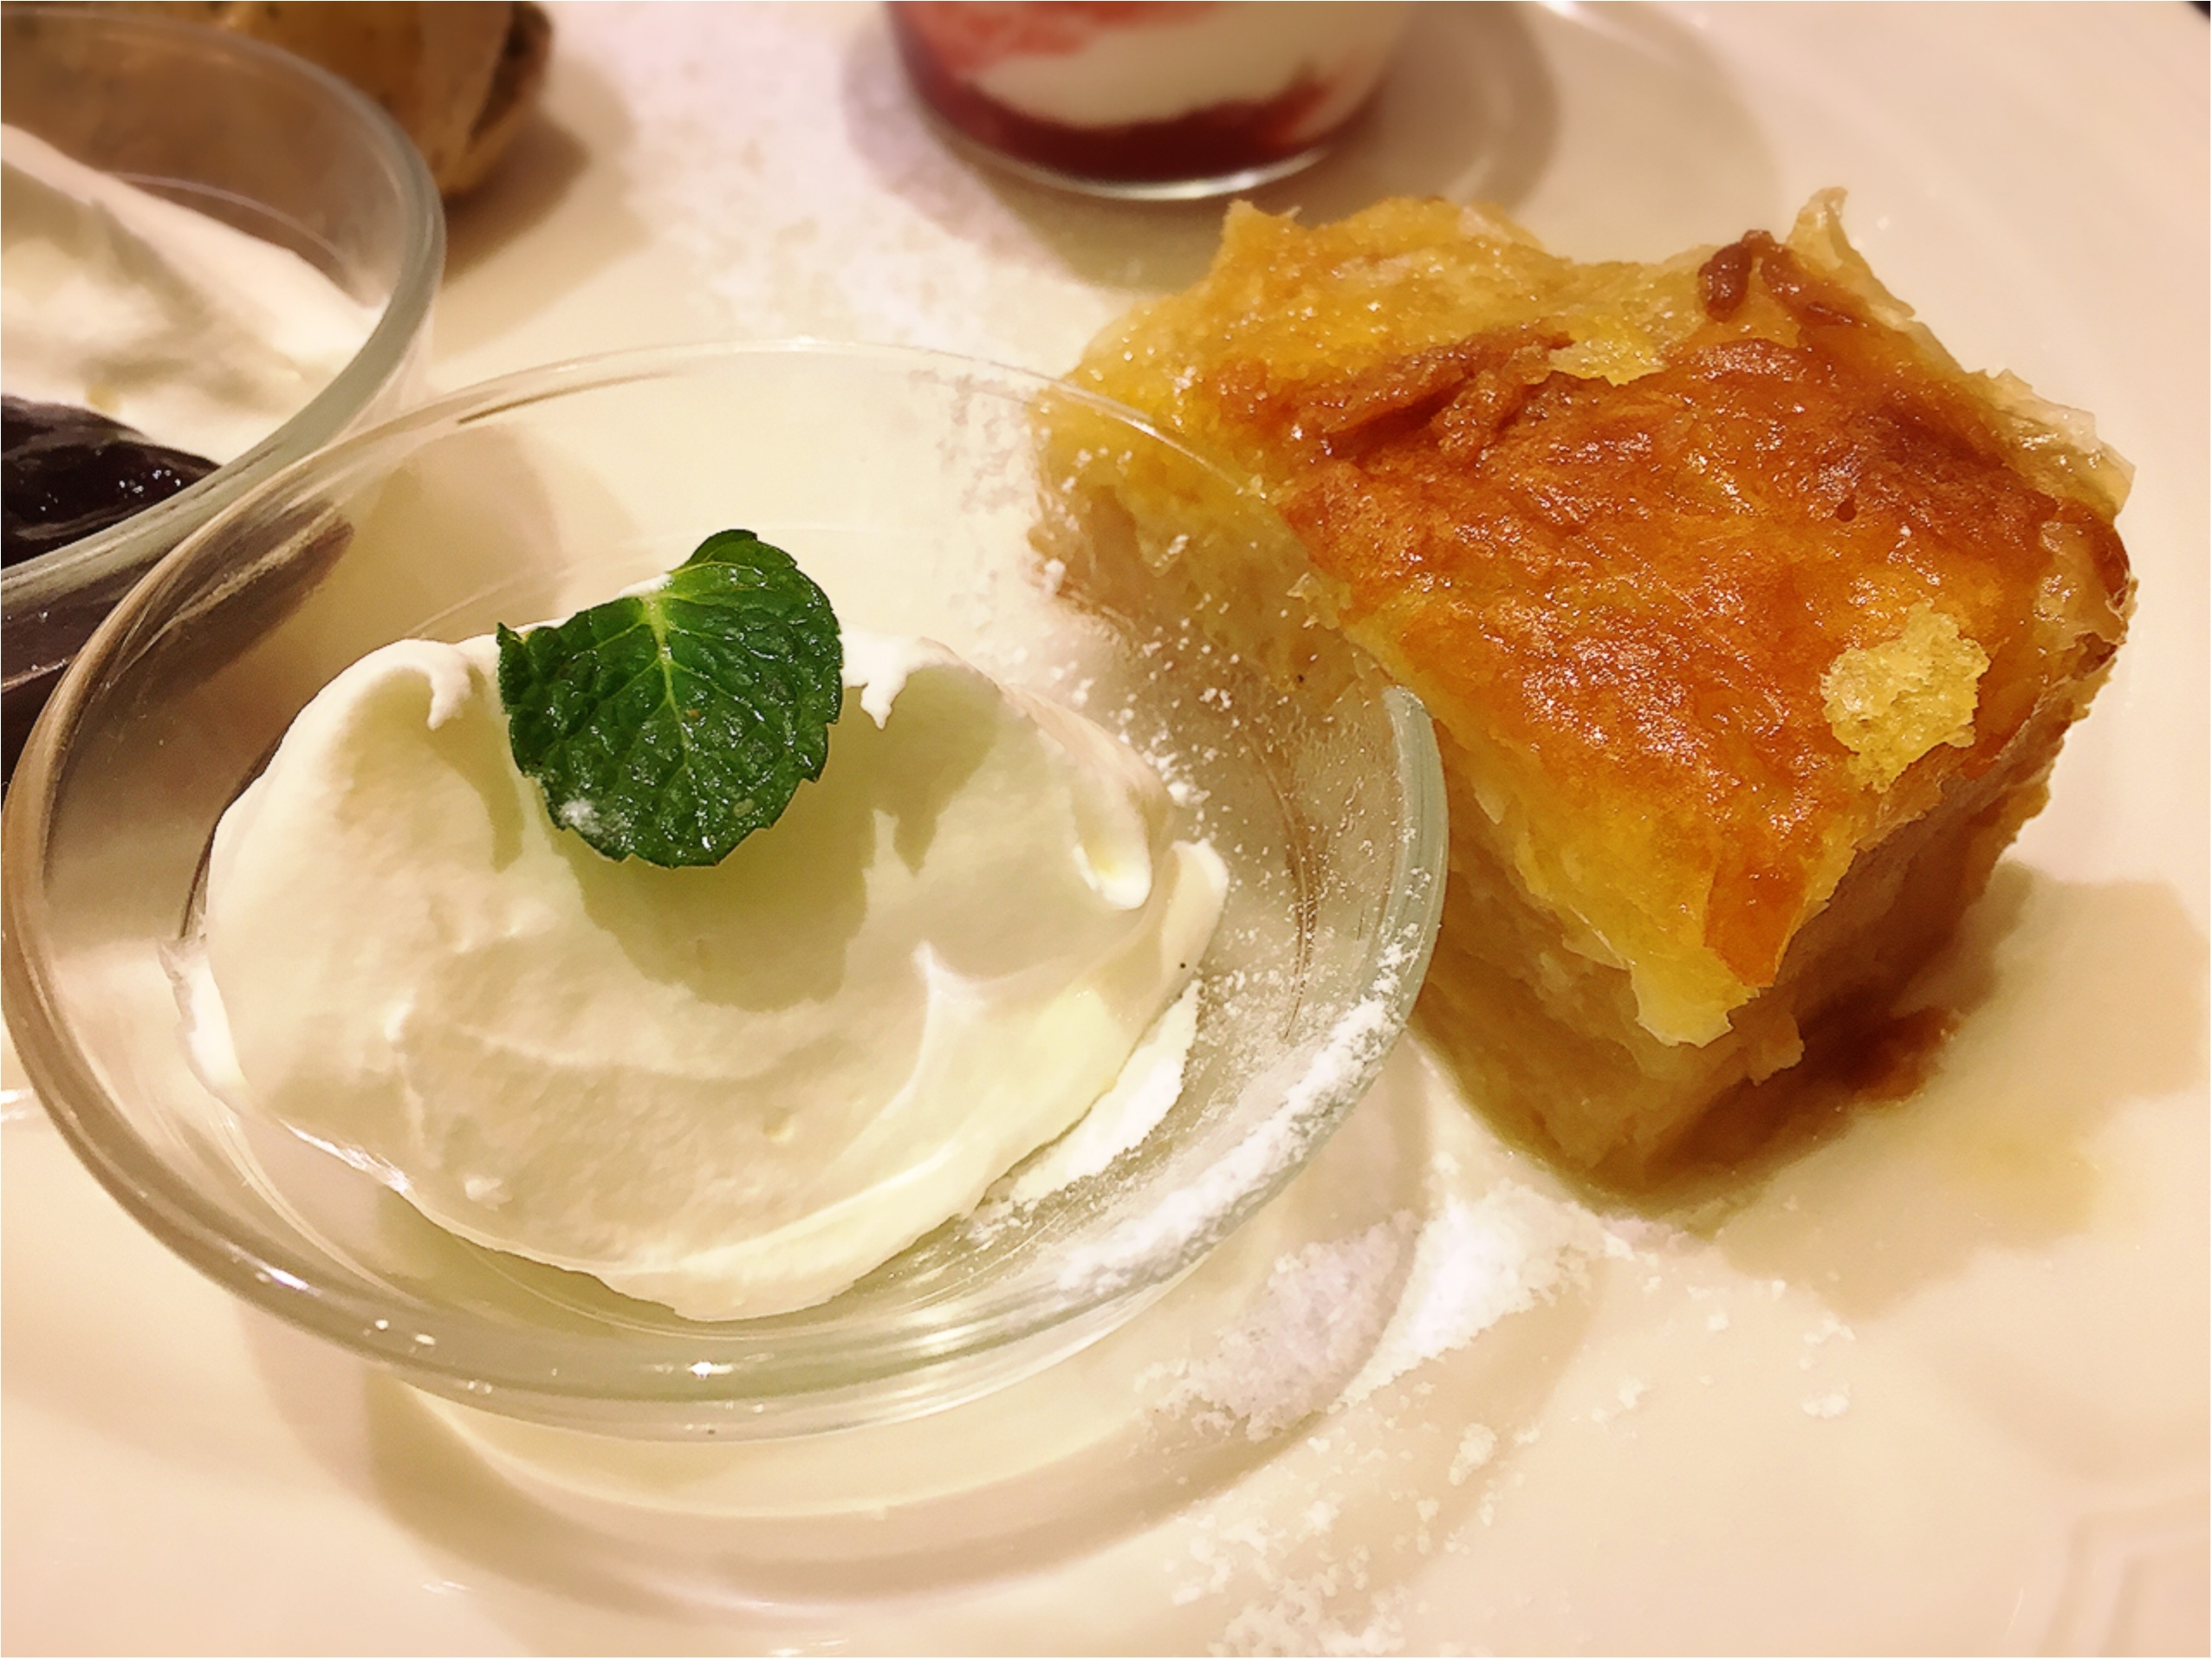 Afternoon Tea tearoom(アフタヌーンティーティールーム)のアフタヌーンティーセットがすき。_5